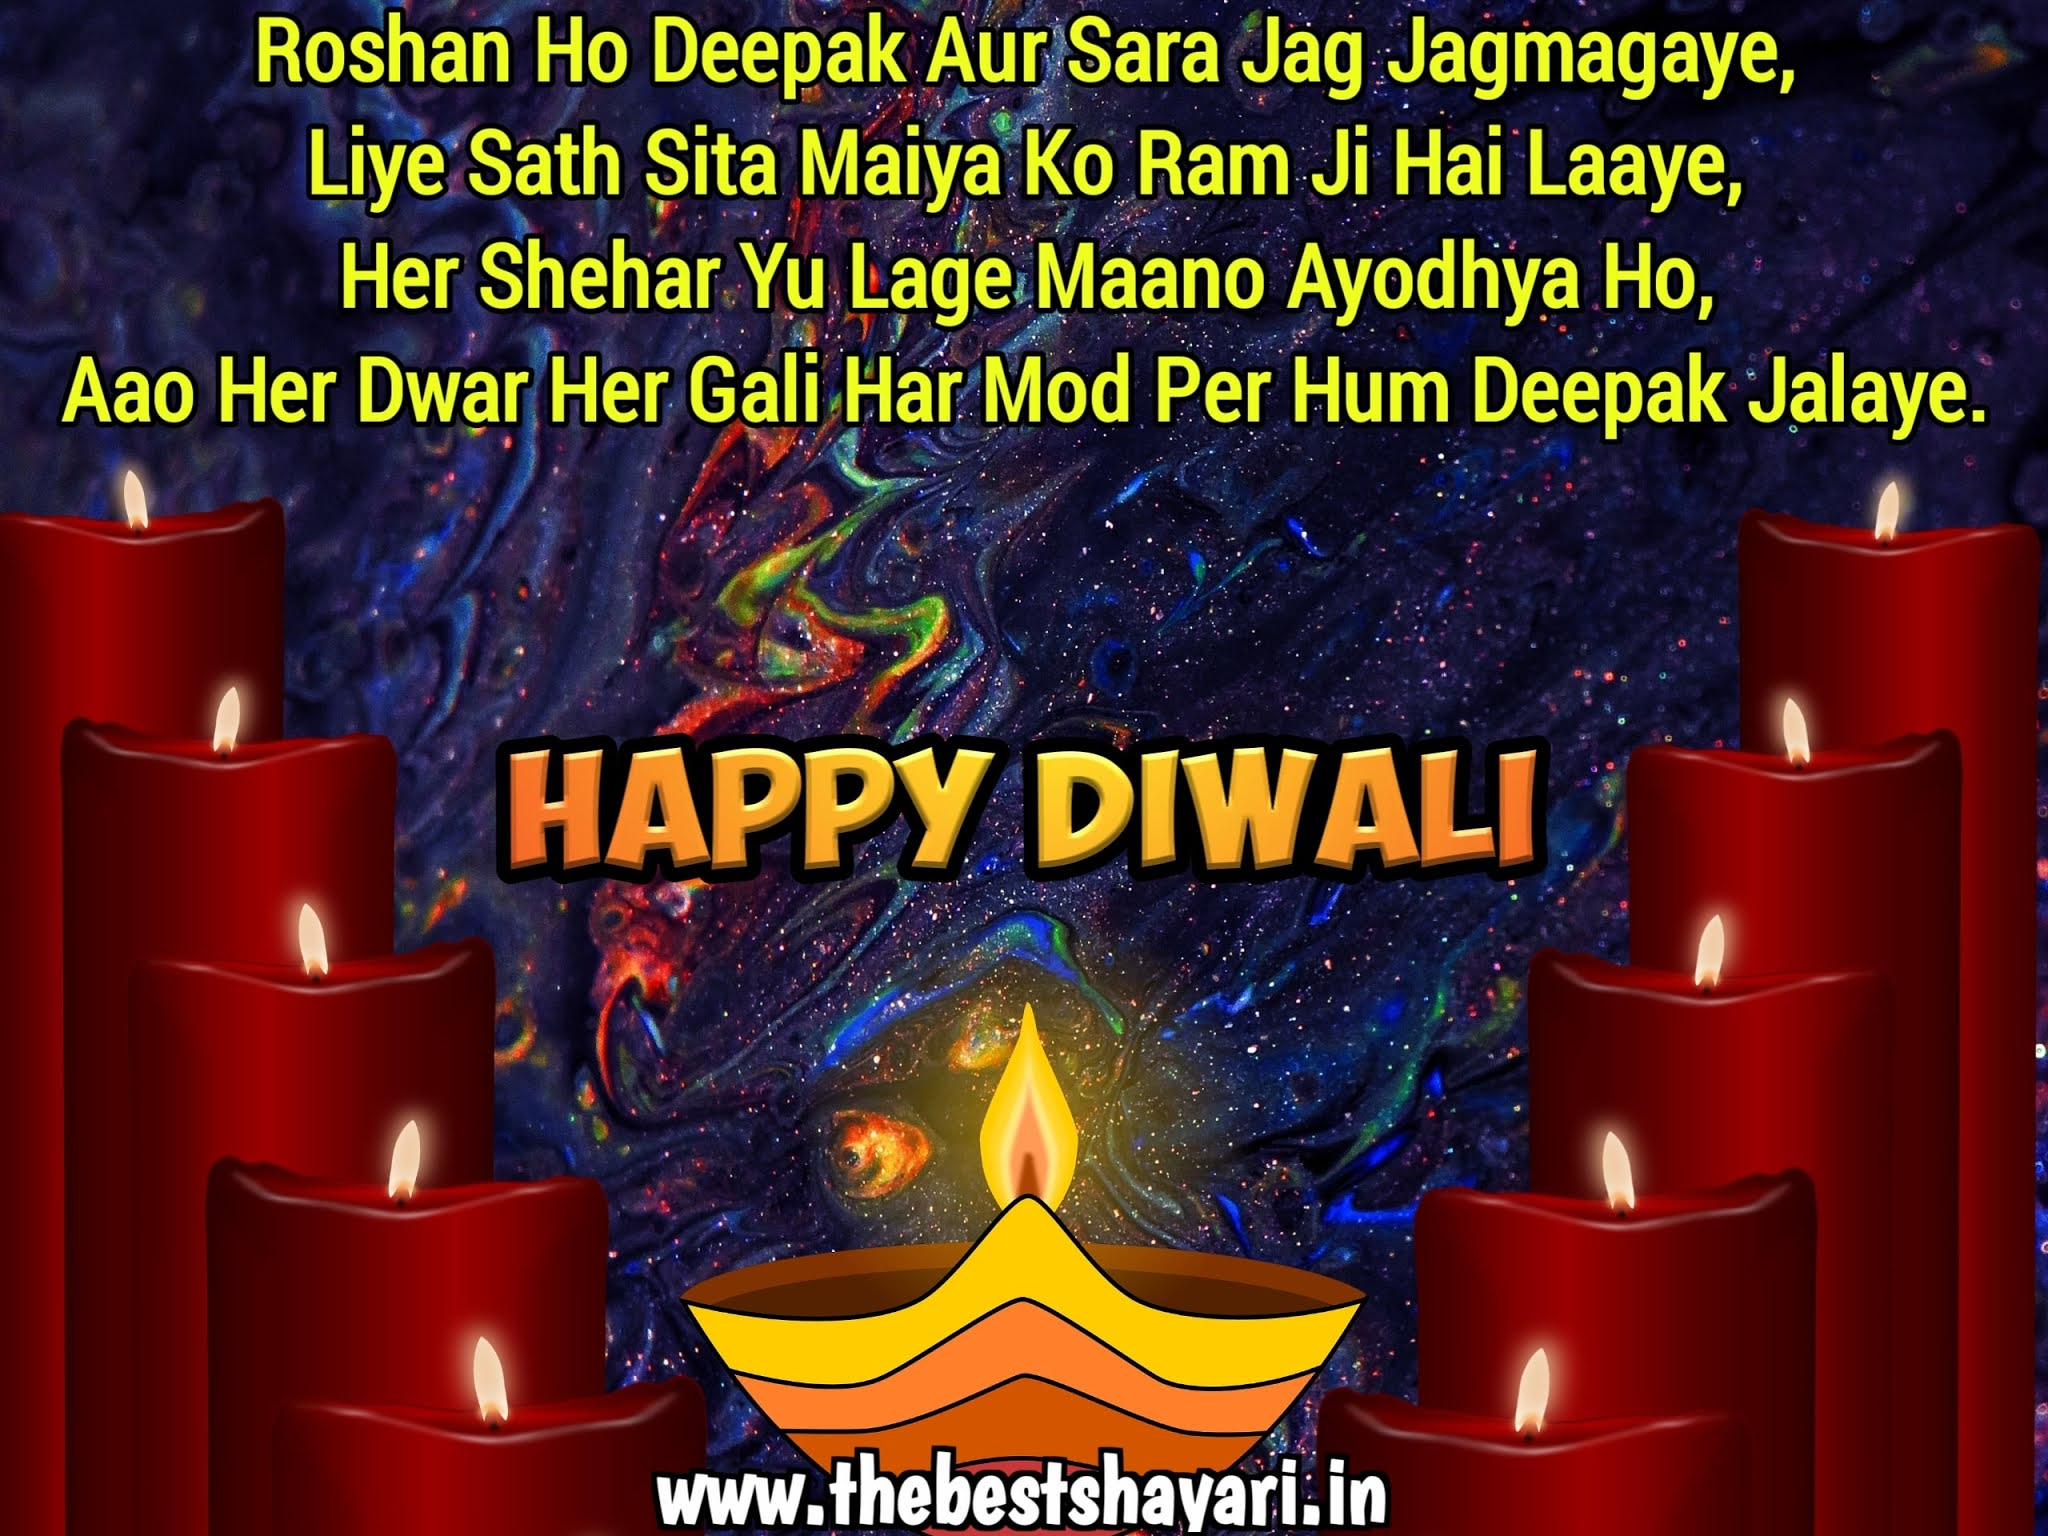 happy Diwali wishes whatsapp images